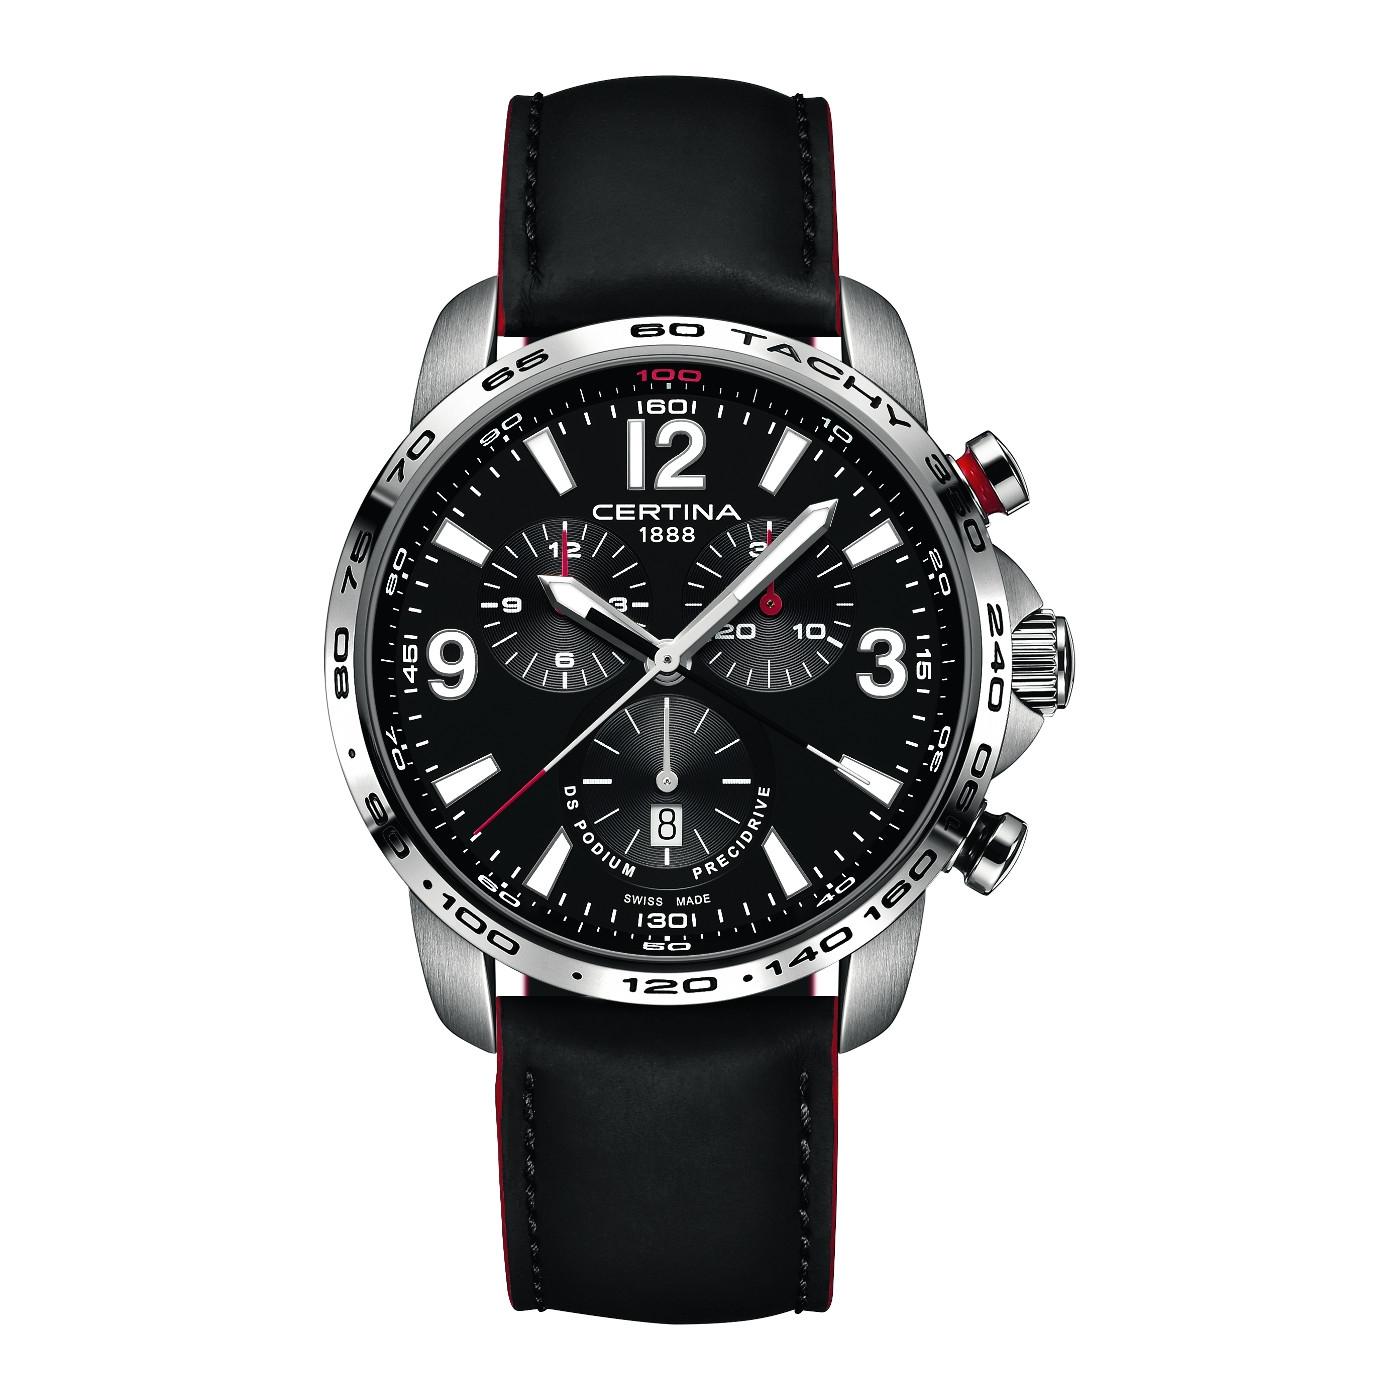 Afbeelding van Certina Sport Podium Big Chronograph horloge C001.647.16.057.01